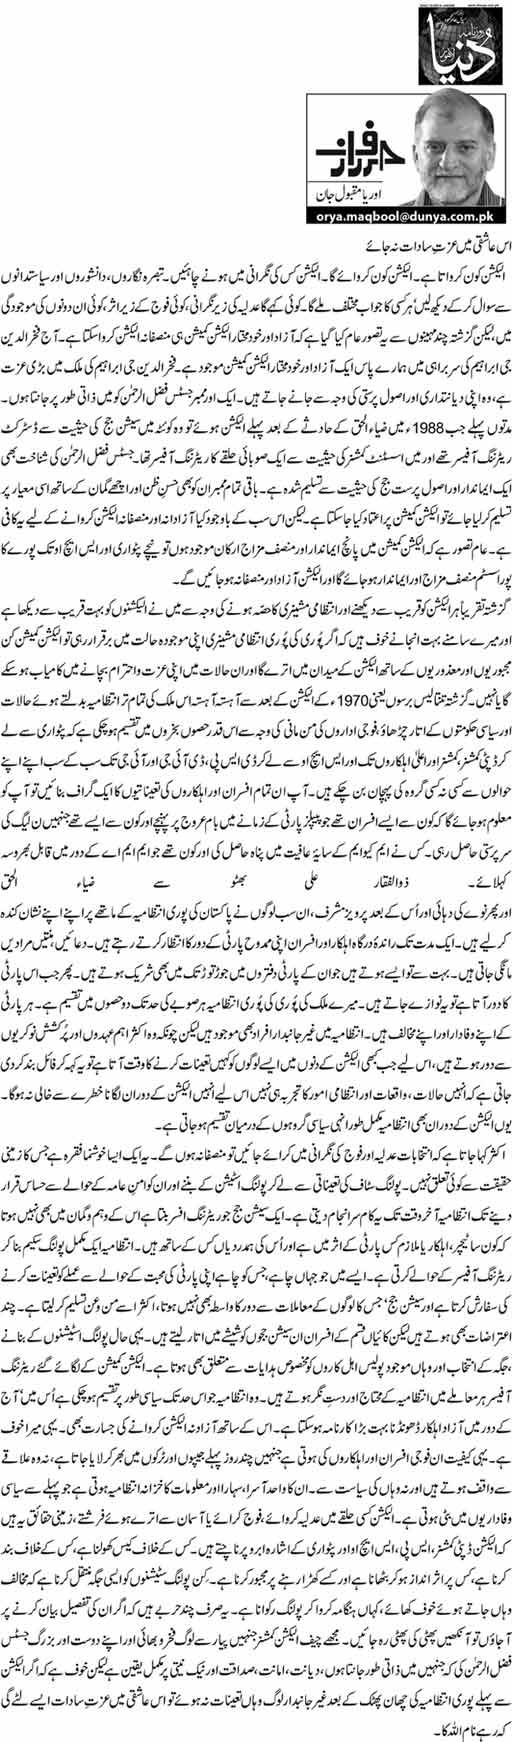 Iss ashiqi main izzat e sadaat na jay - Orya Maqbool Jan